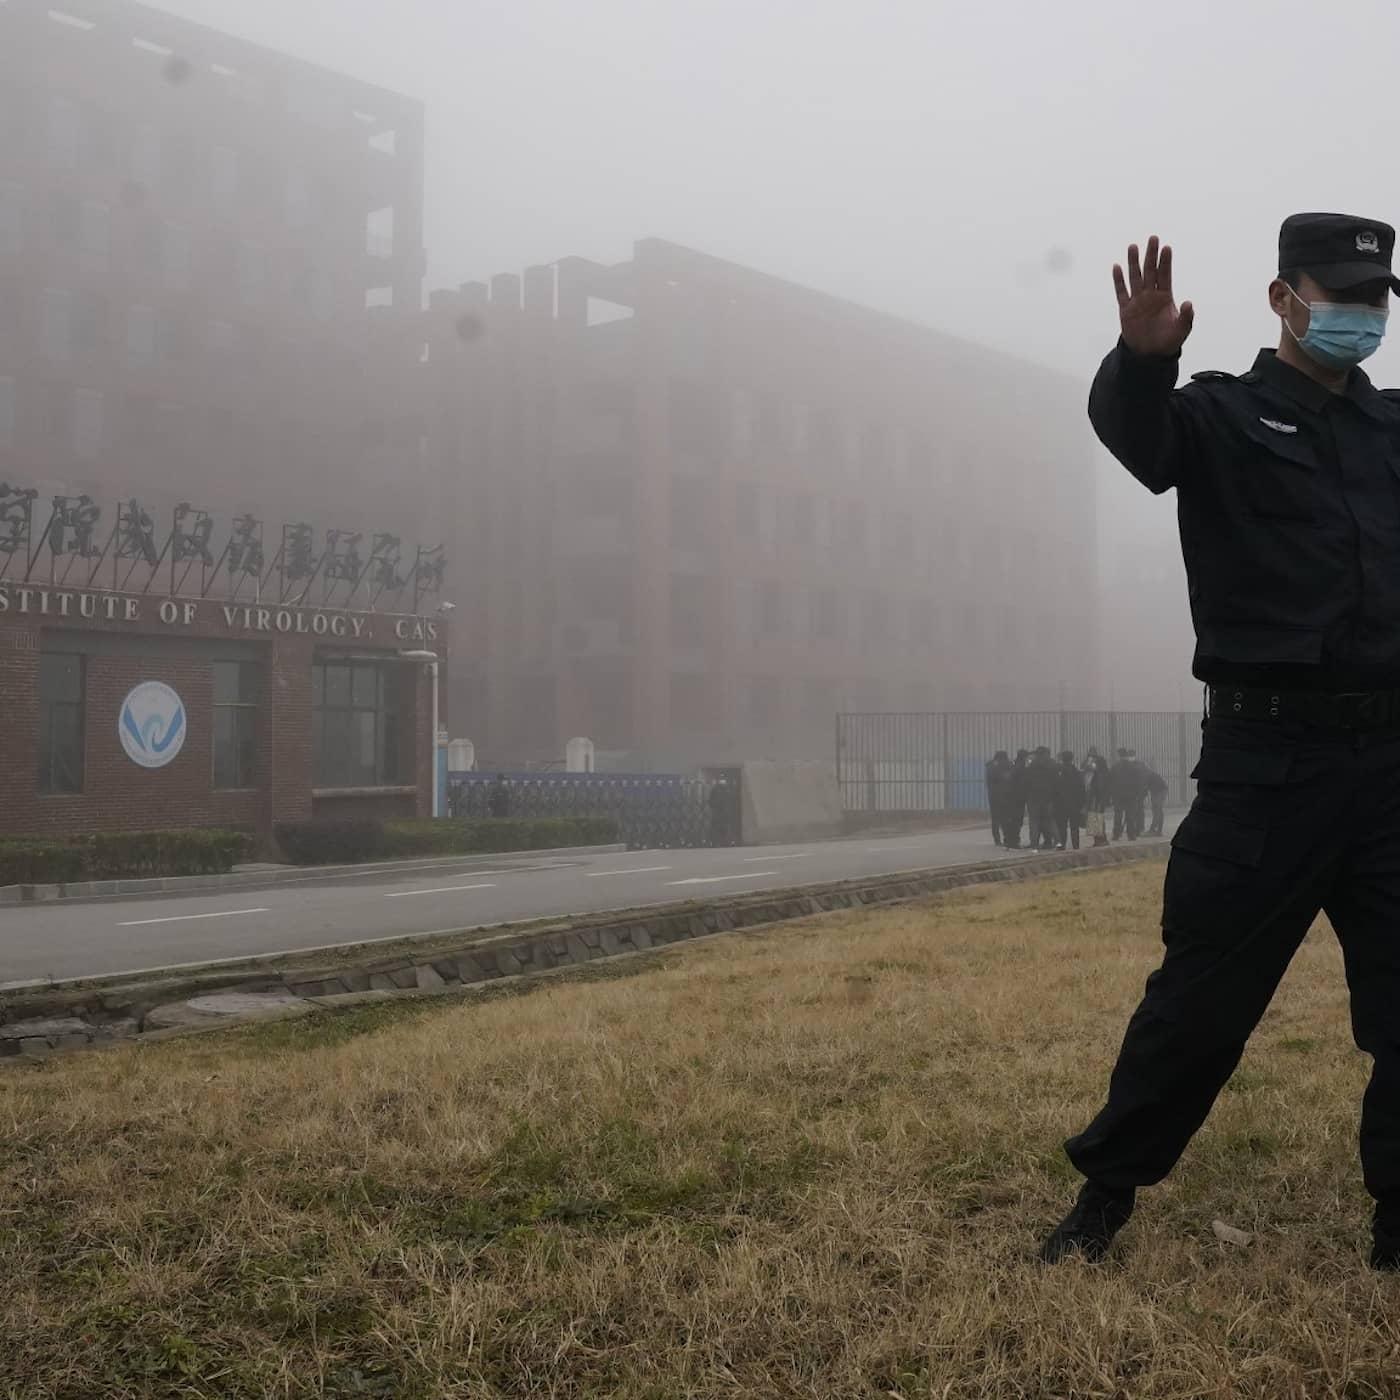 Mysteriet kring viruslabbet i Wuhan